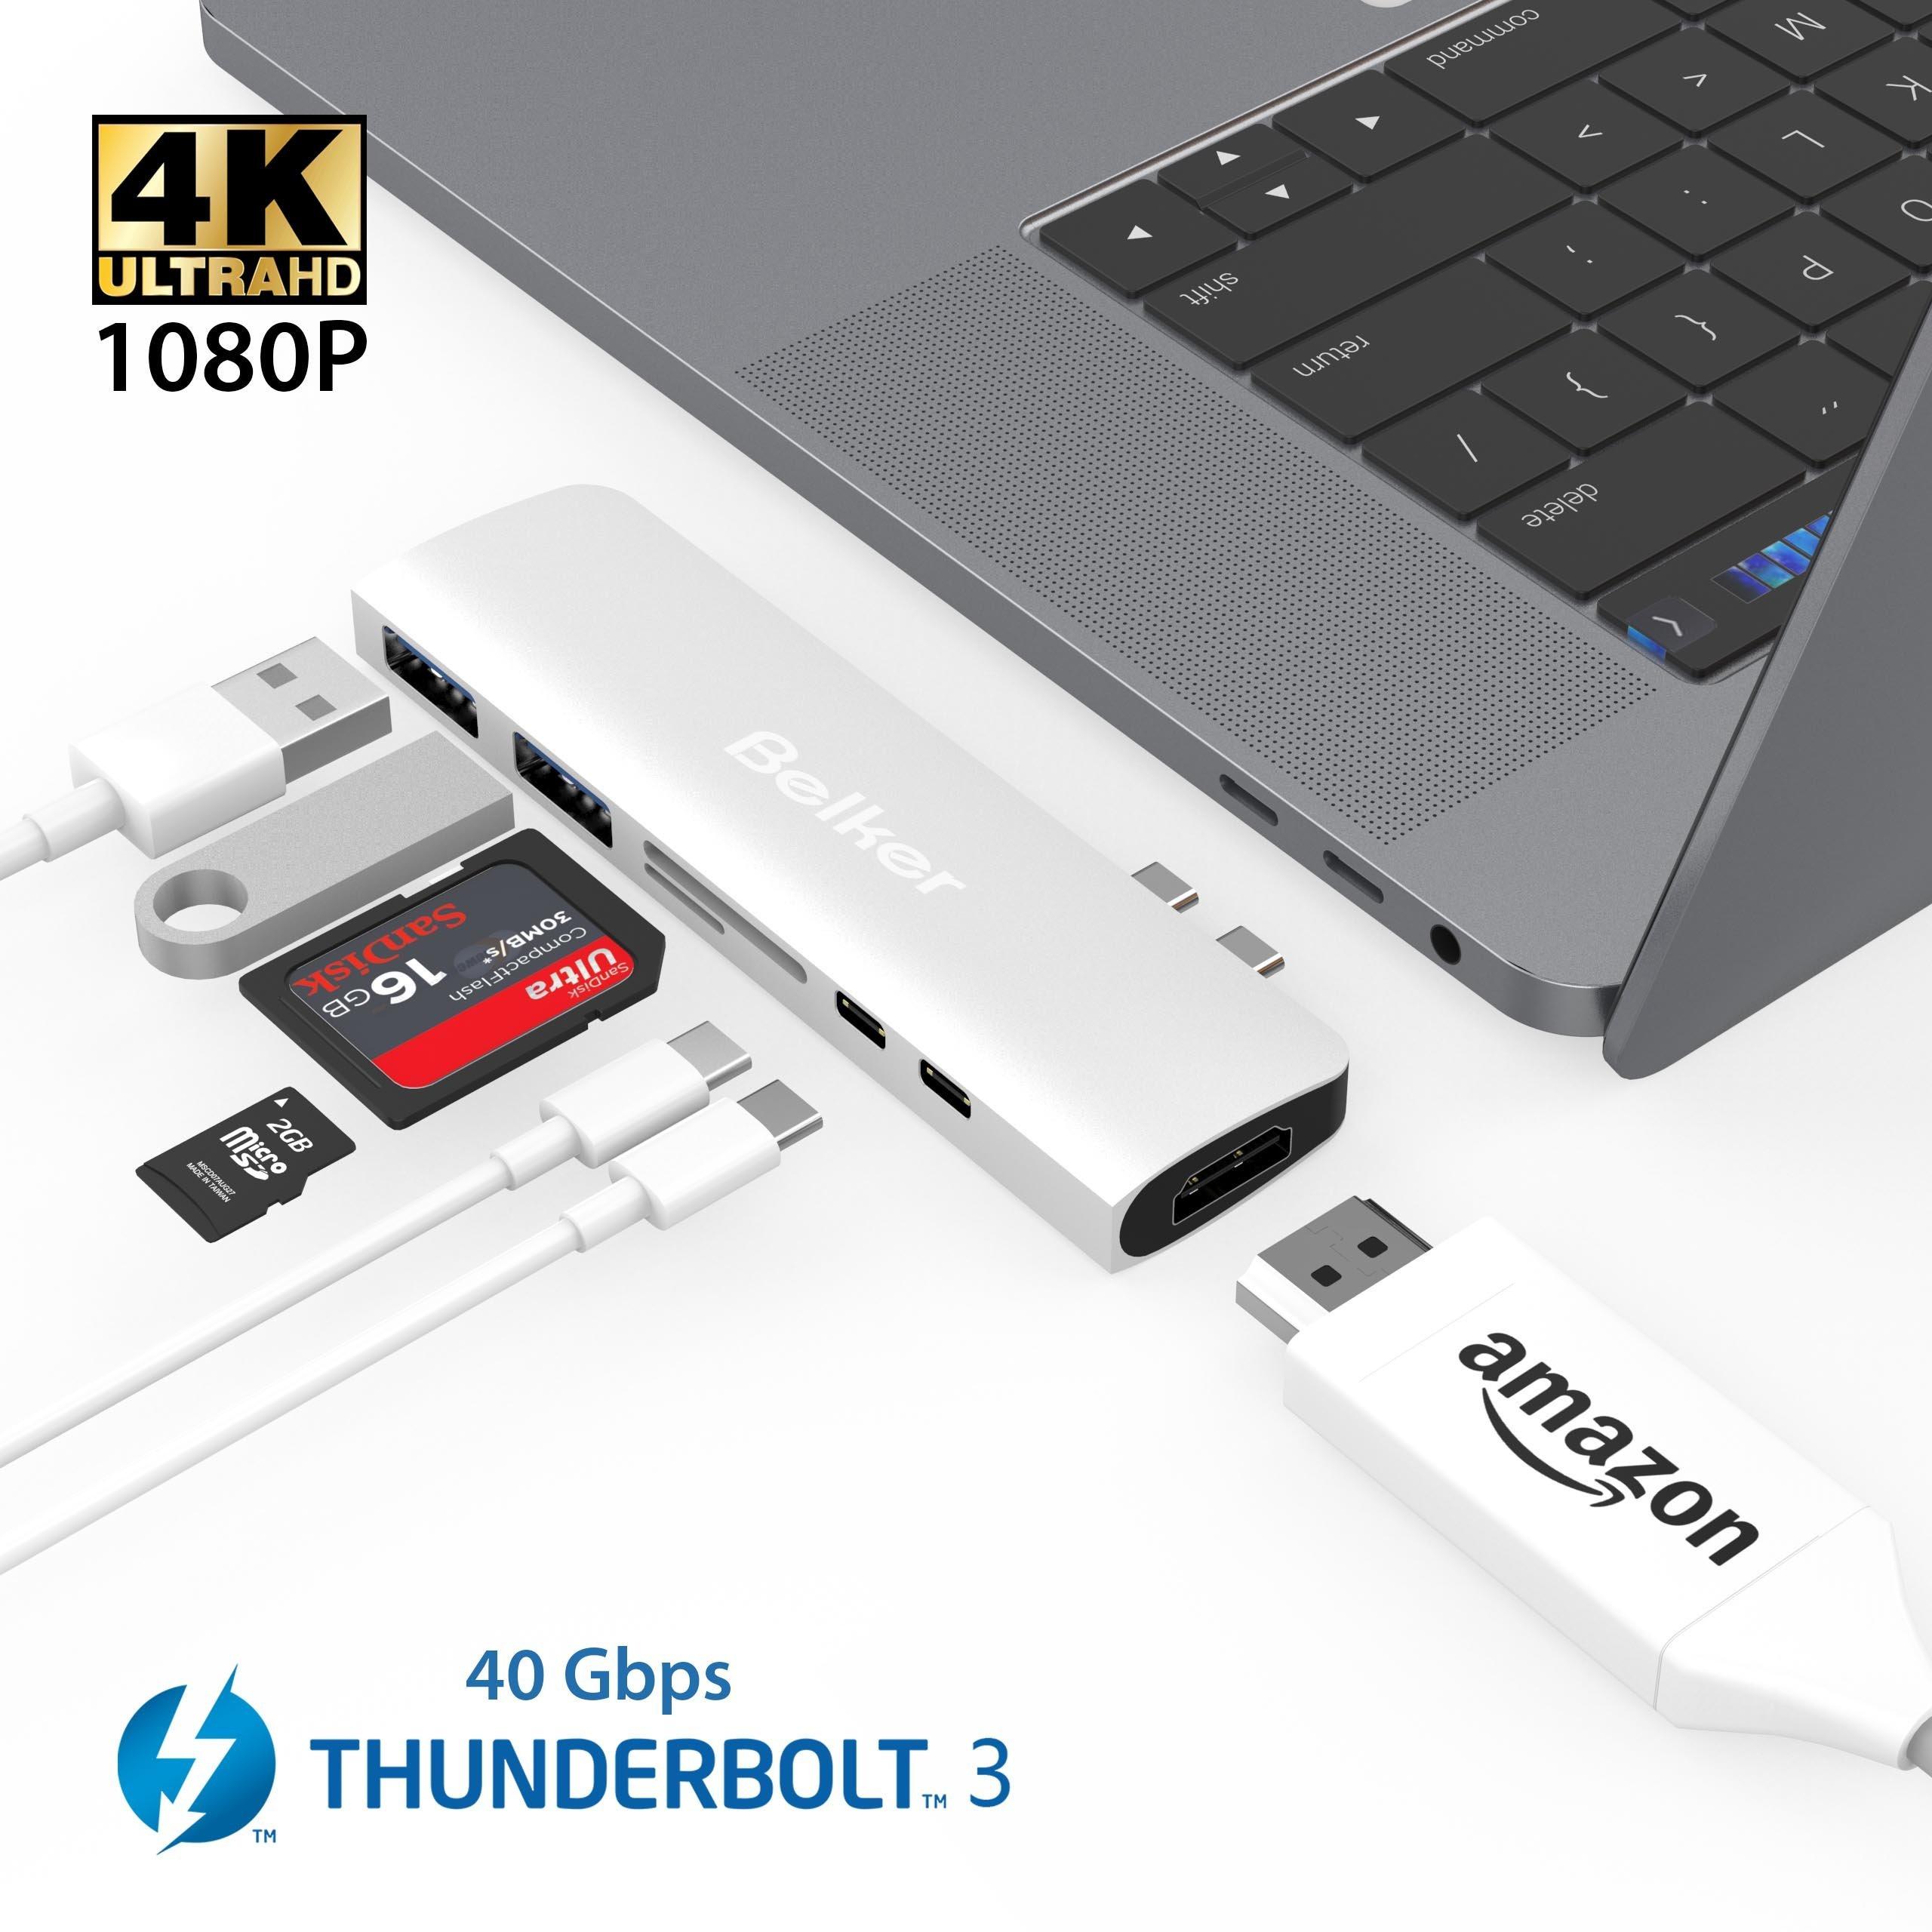 USB C Thunderbolt 3 HDMI Hub MacBook Pro,Belker 7 in 1 40Gb/s Thunderbolt 3 USB-C HDMI Hub Adapter HDMI,2 x USB 3.0, microSD, SD, Thunderbolt 3,USB-C(Sliver)